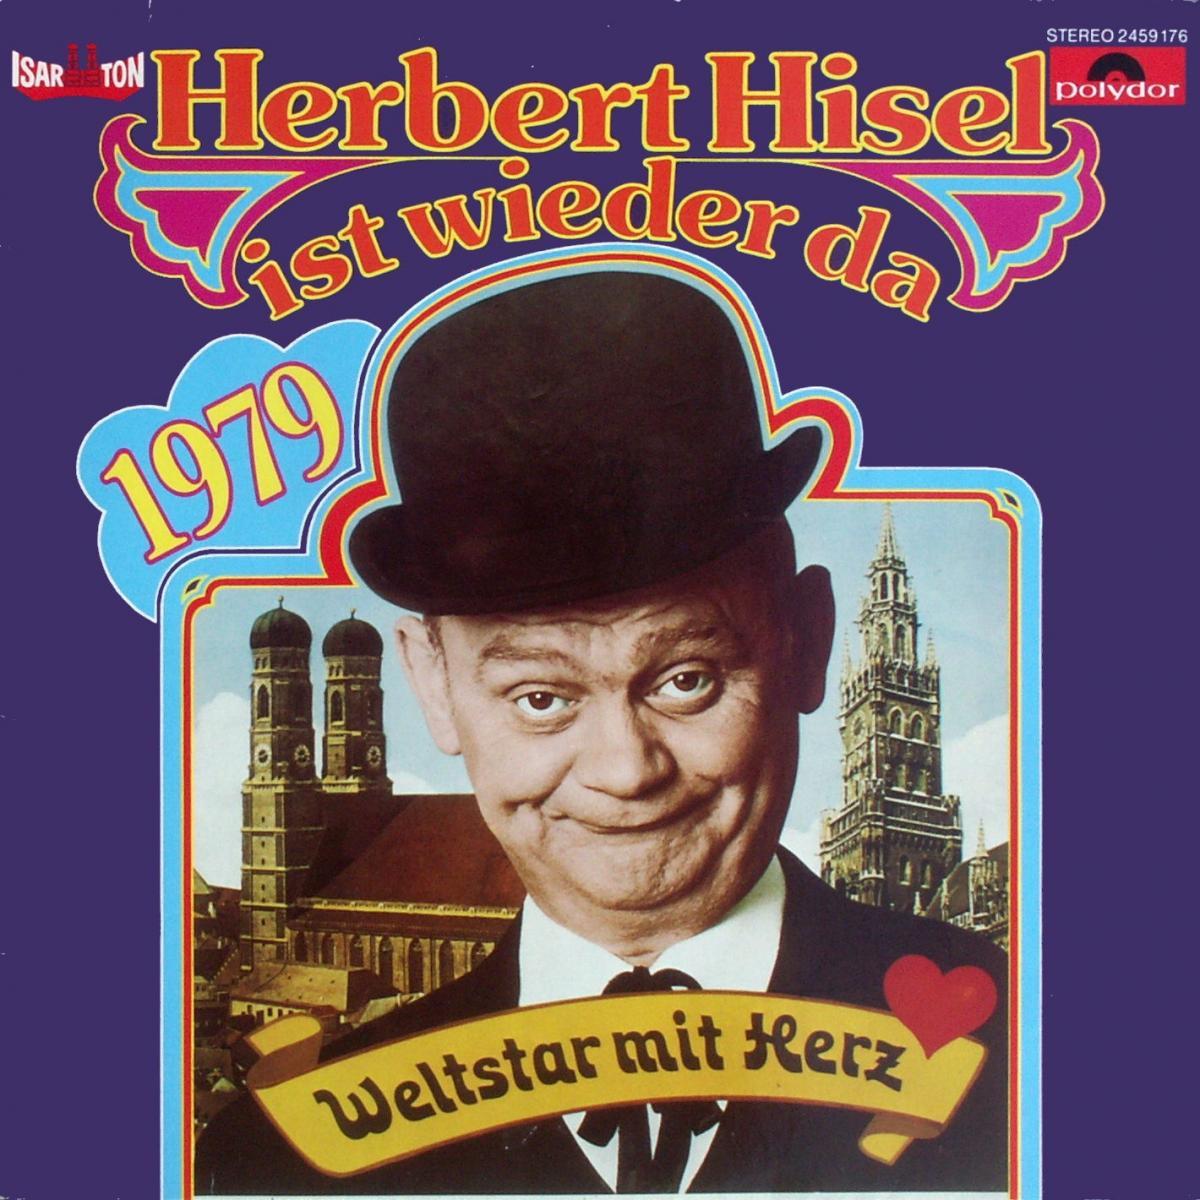 Hisel, Herbert - Herbert Hisel Ist Wieder Da - 1979 - Ein Weltstar mit Herz [LP]